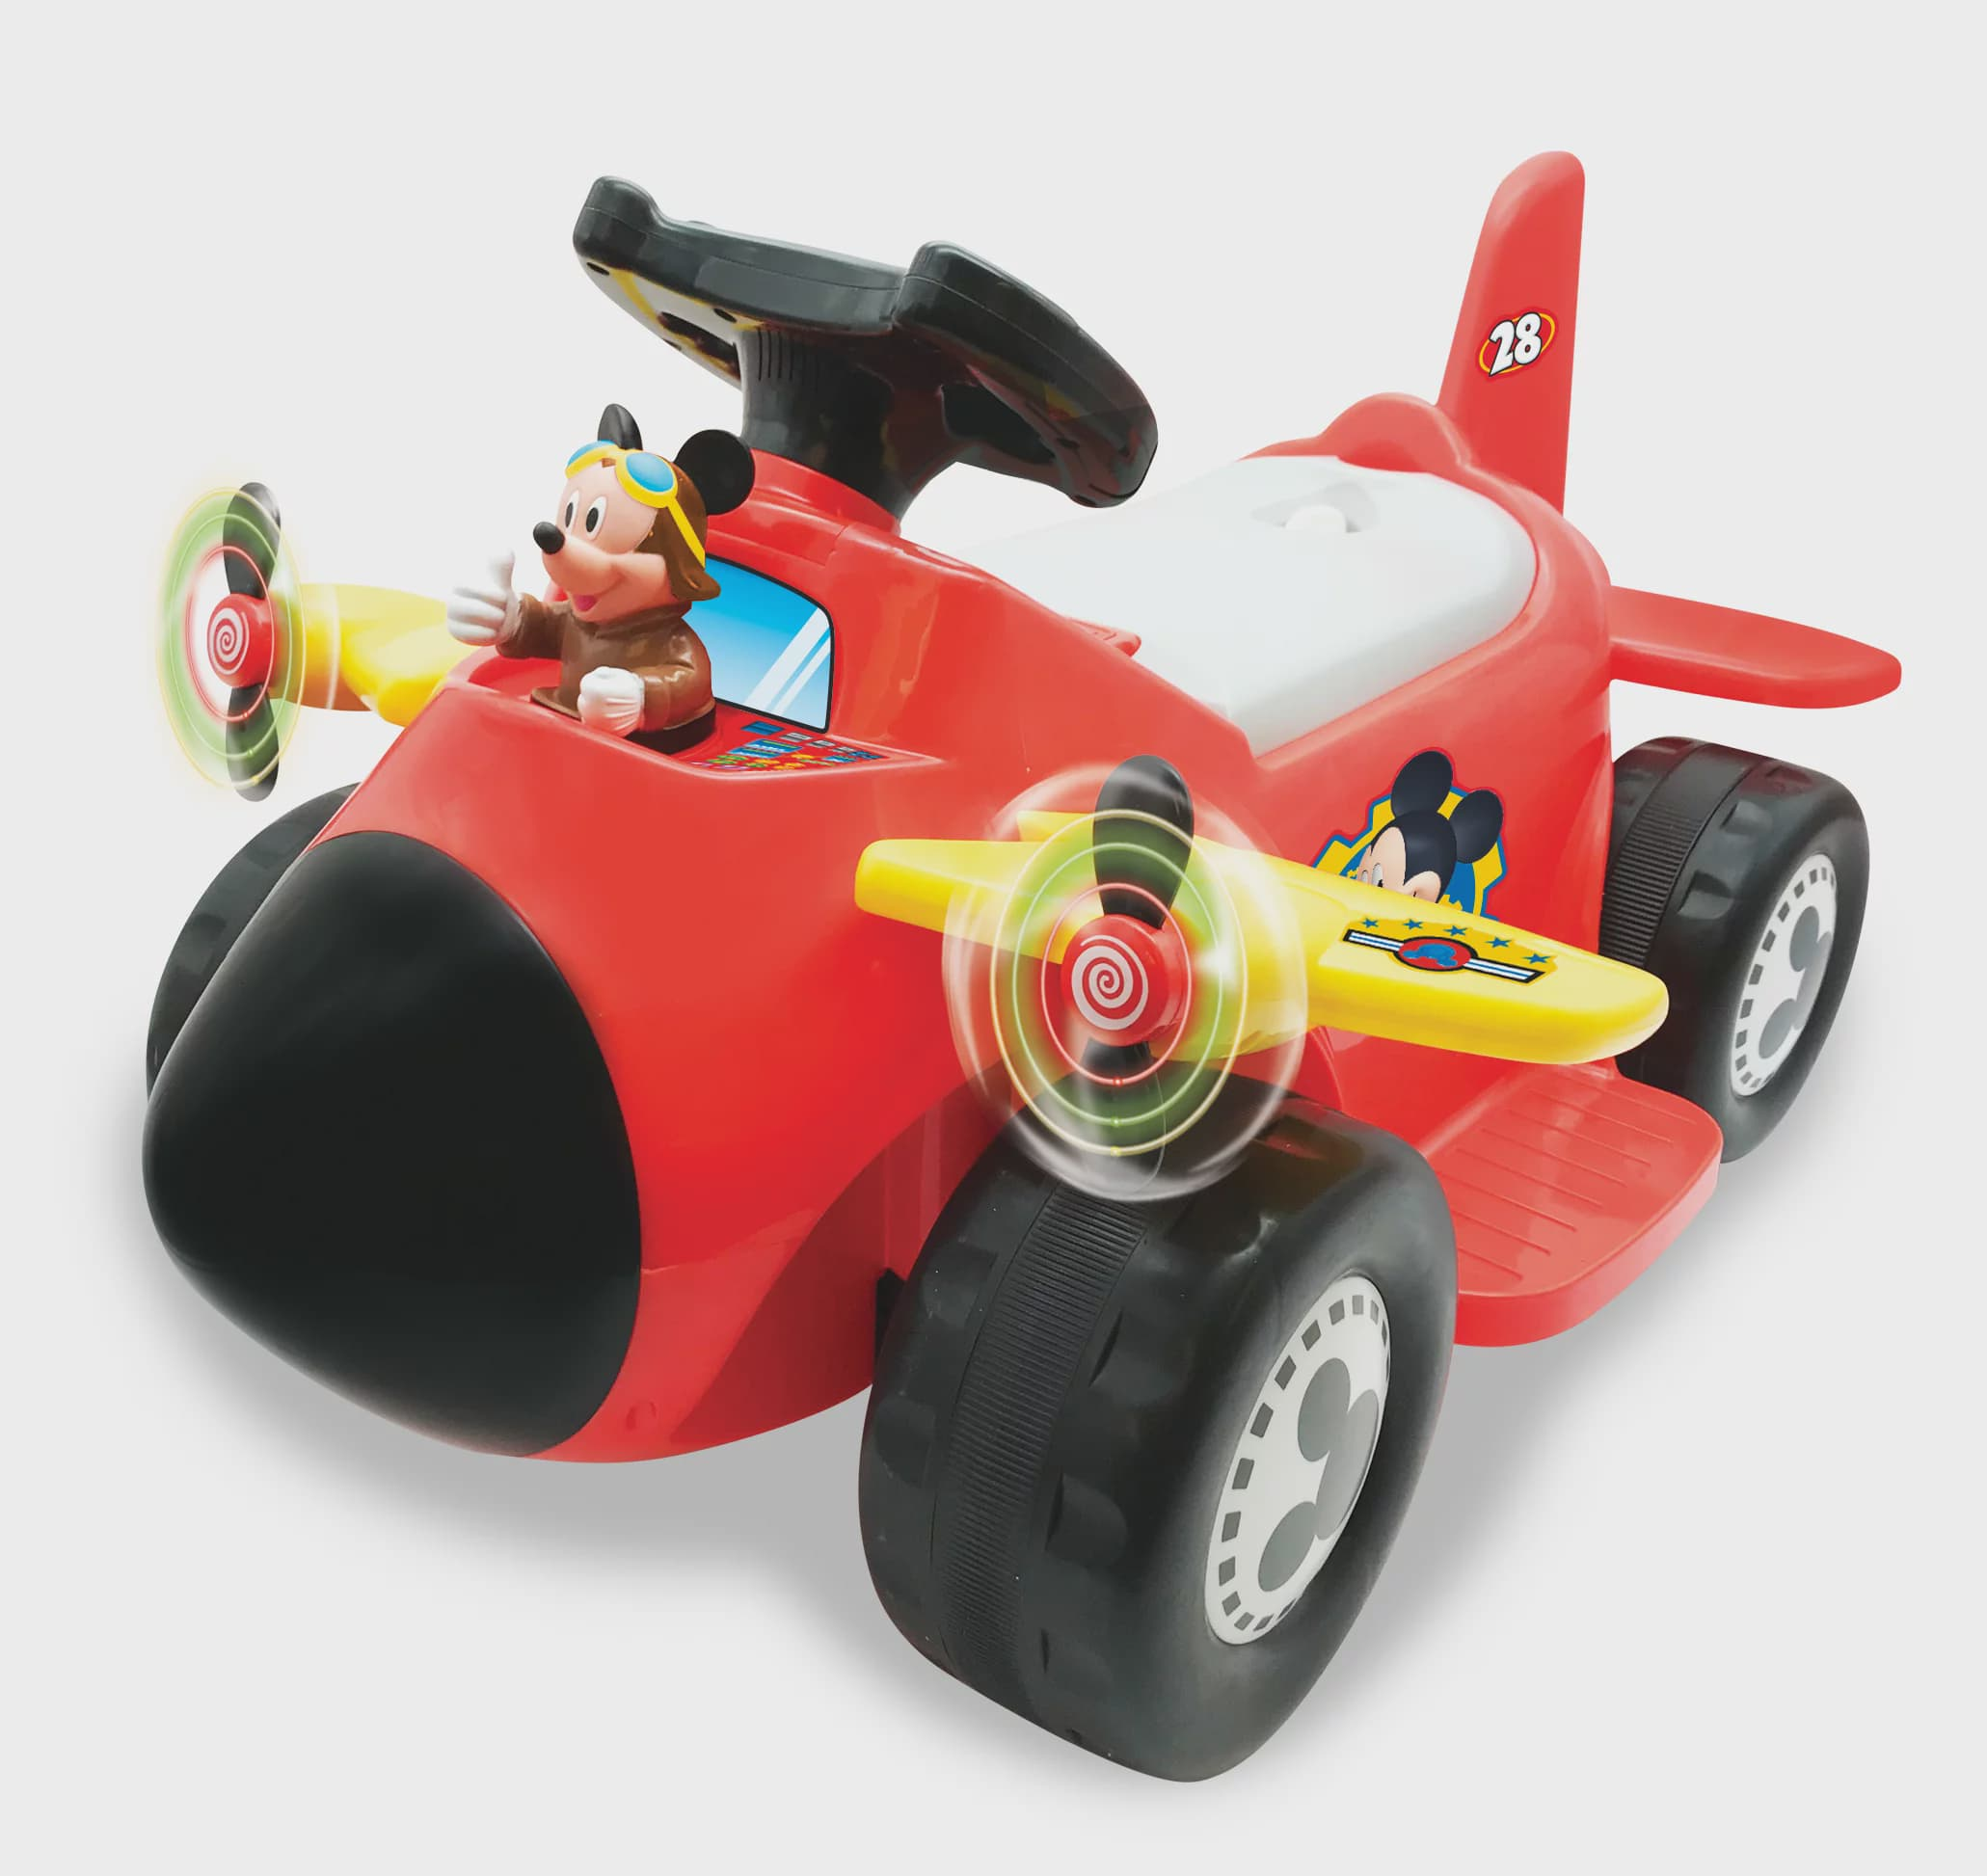 Disney Mickey Mouse 6-Volt Powered Acivity Plane Ride-On